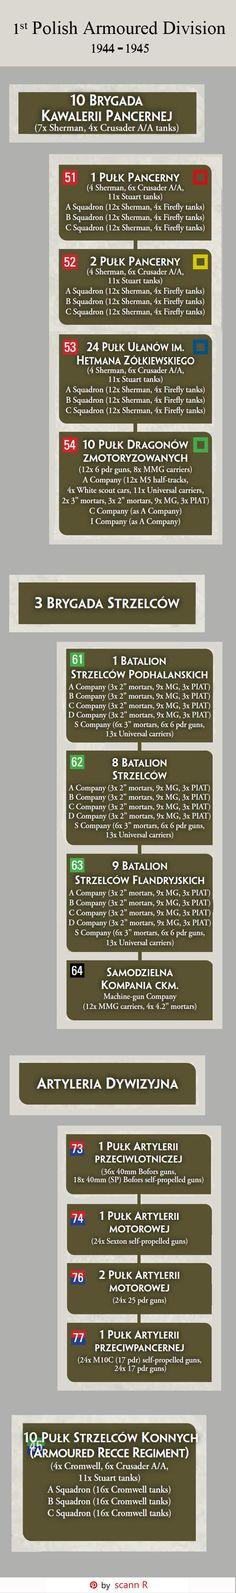 British Army, World War Ii, Ww2, Division, Poland, Military, The Unit, War, Military Uniforms